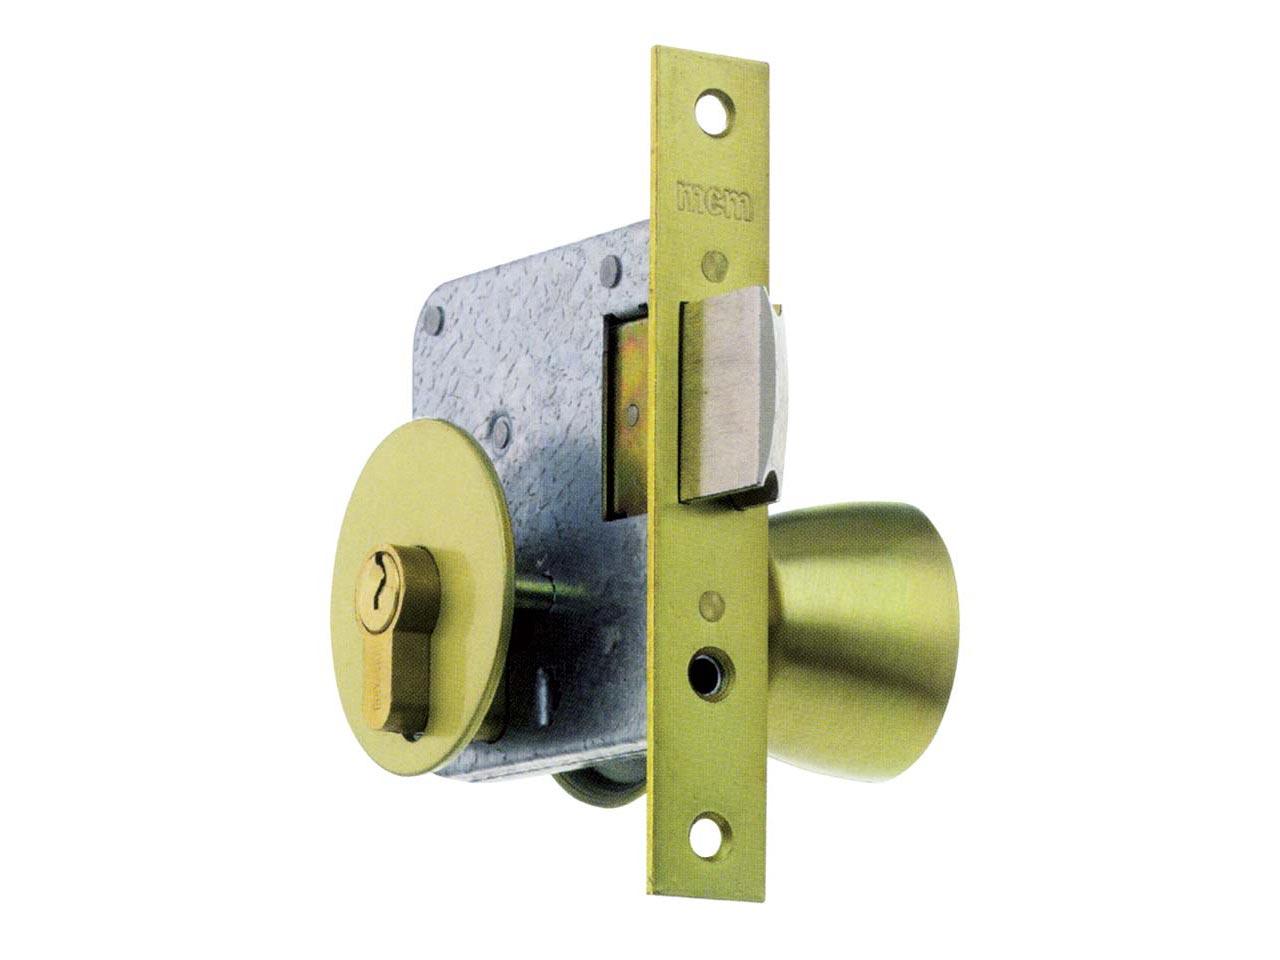 Sufersa cerradura mcm 1561 pomo - Pomo puerta exterior ...